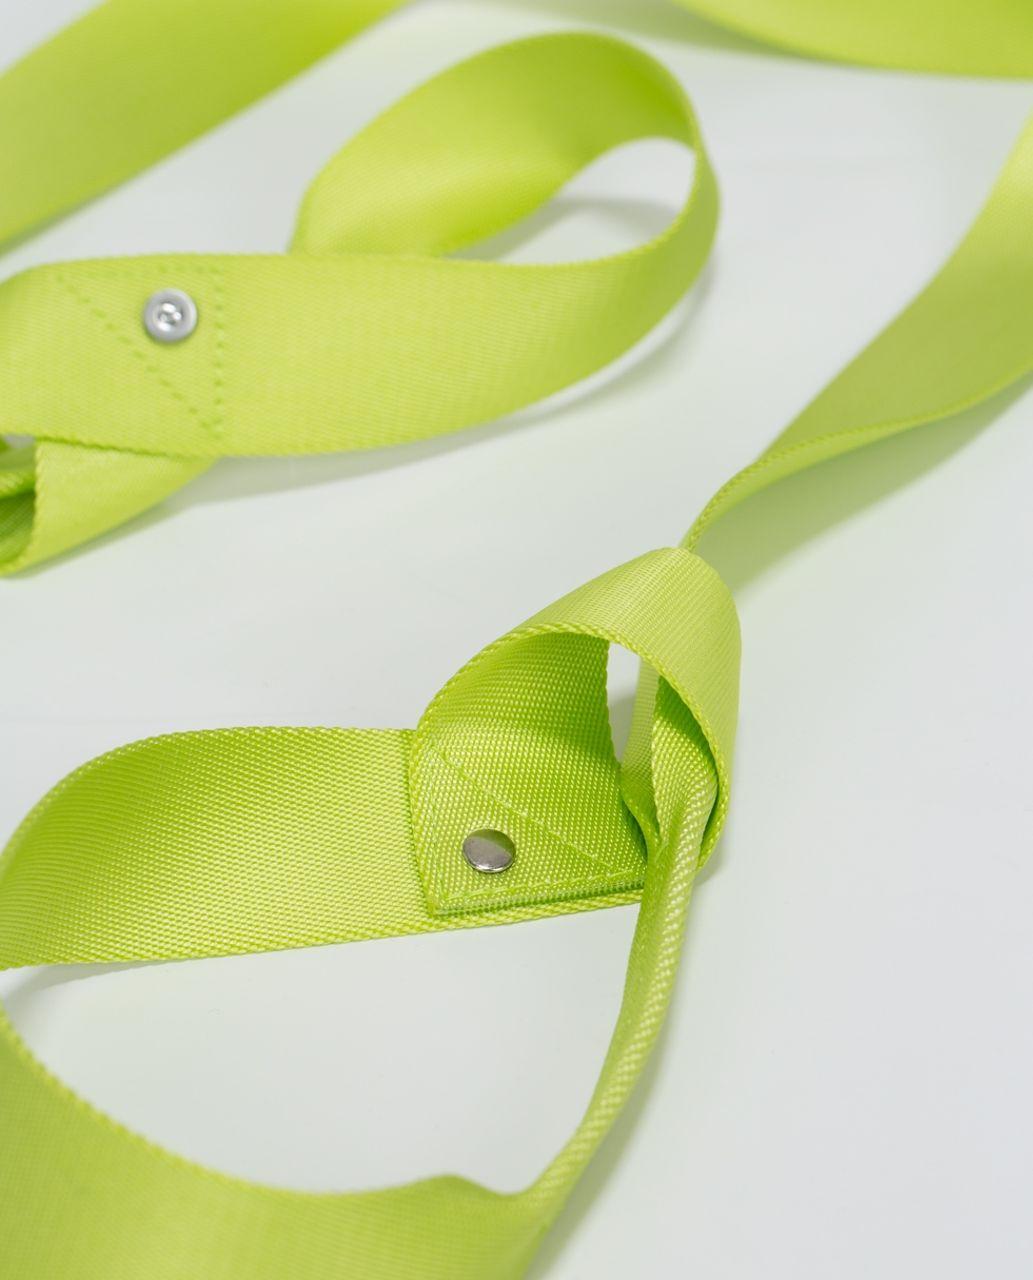 Lululemon Loop It Up Mat Strap - Antidote